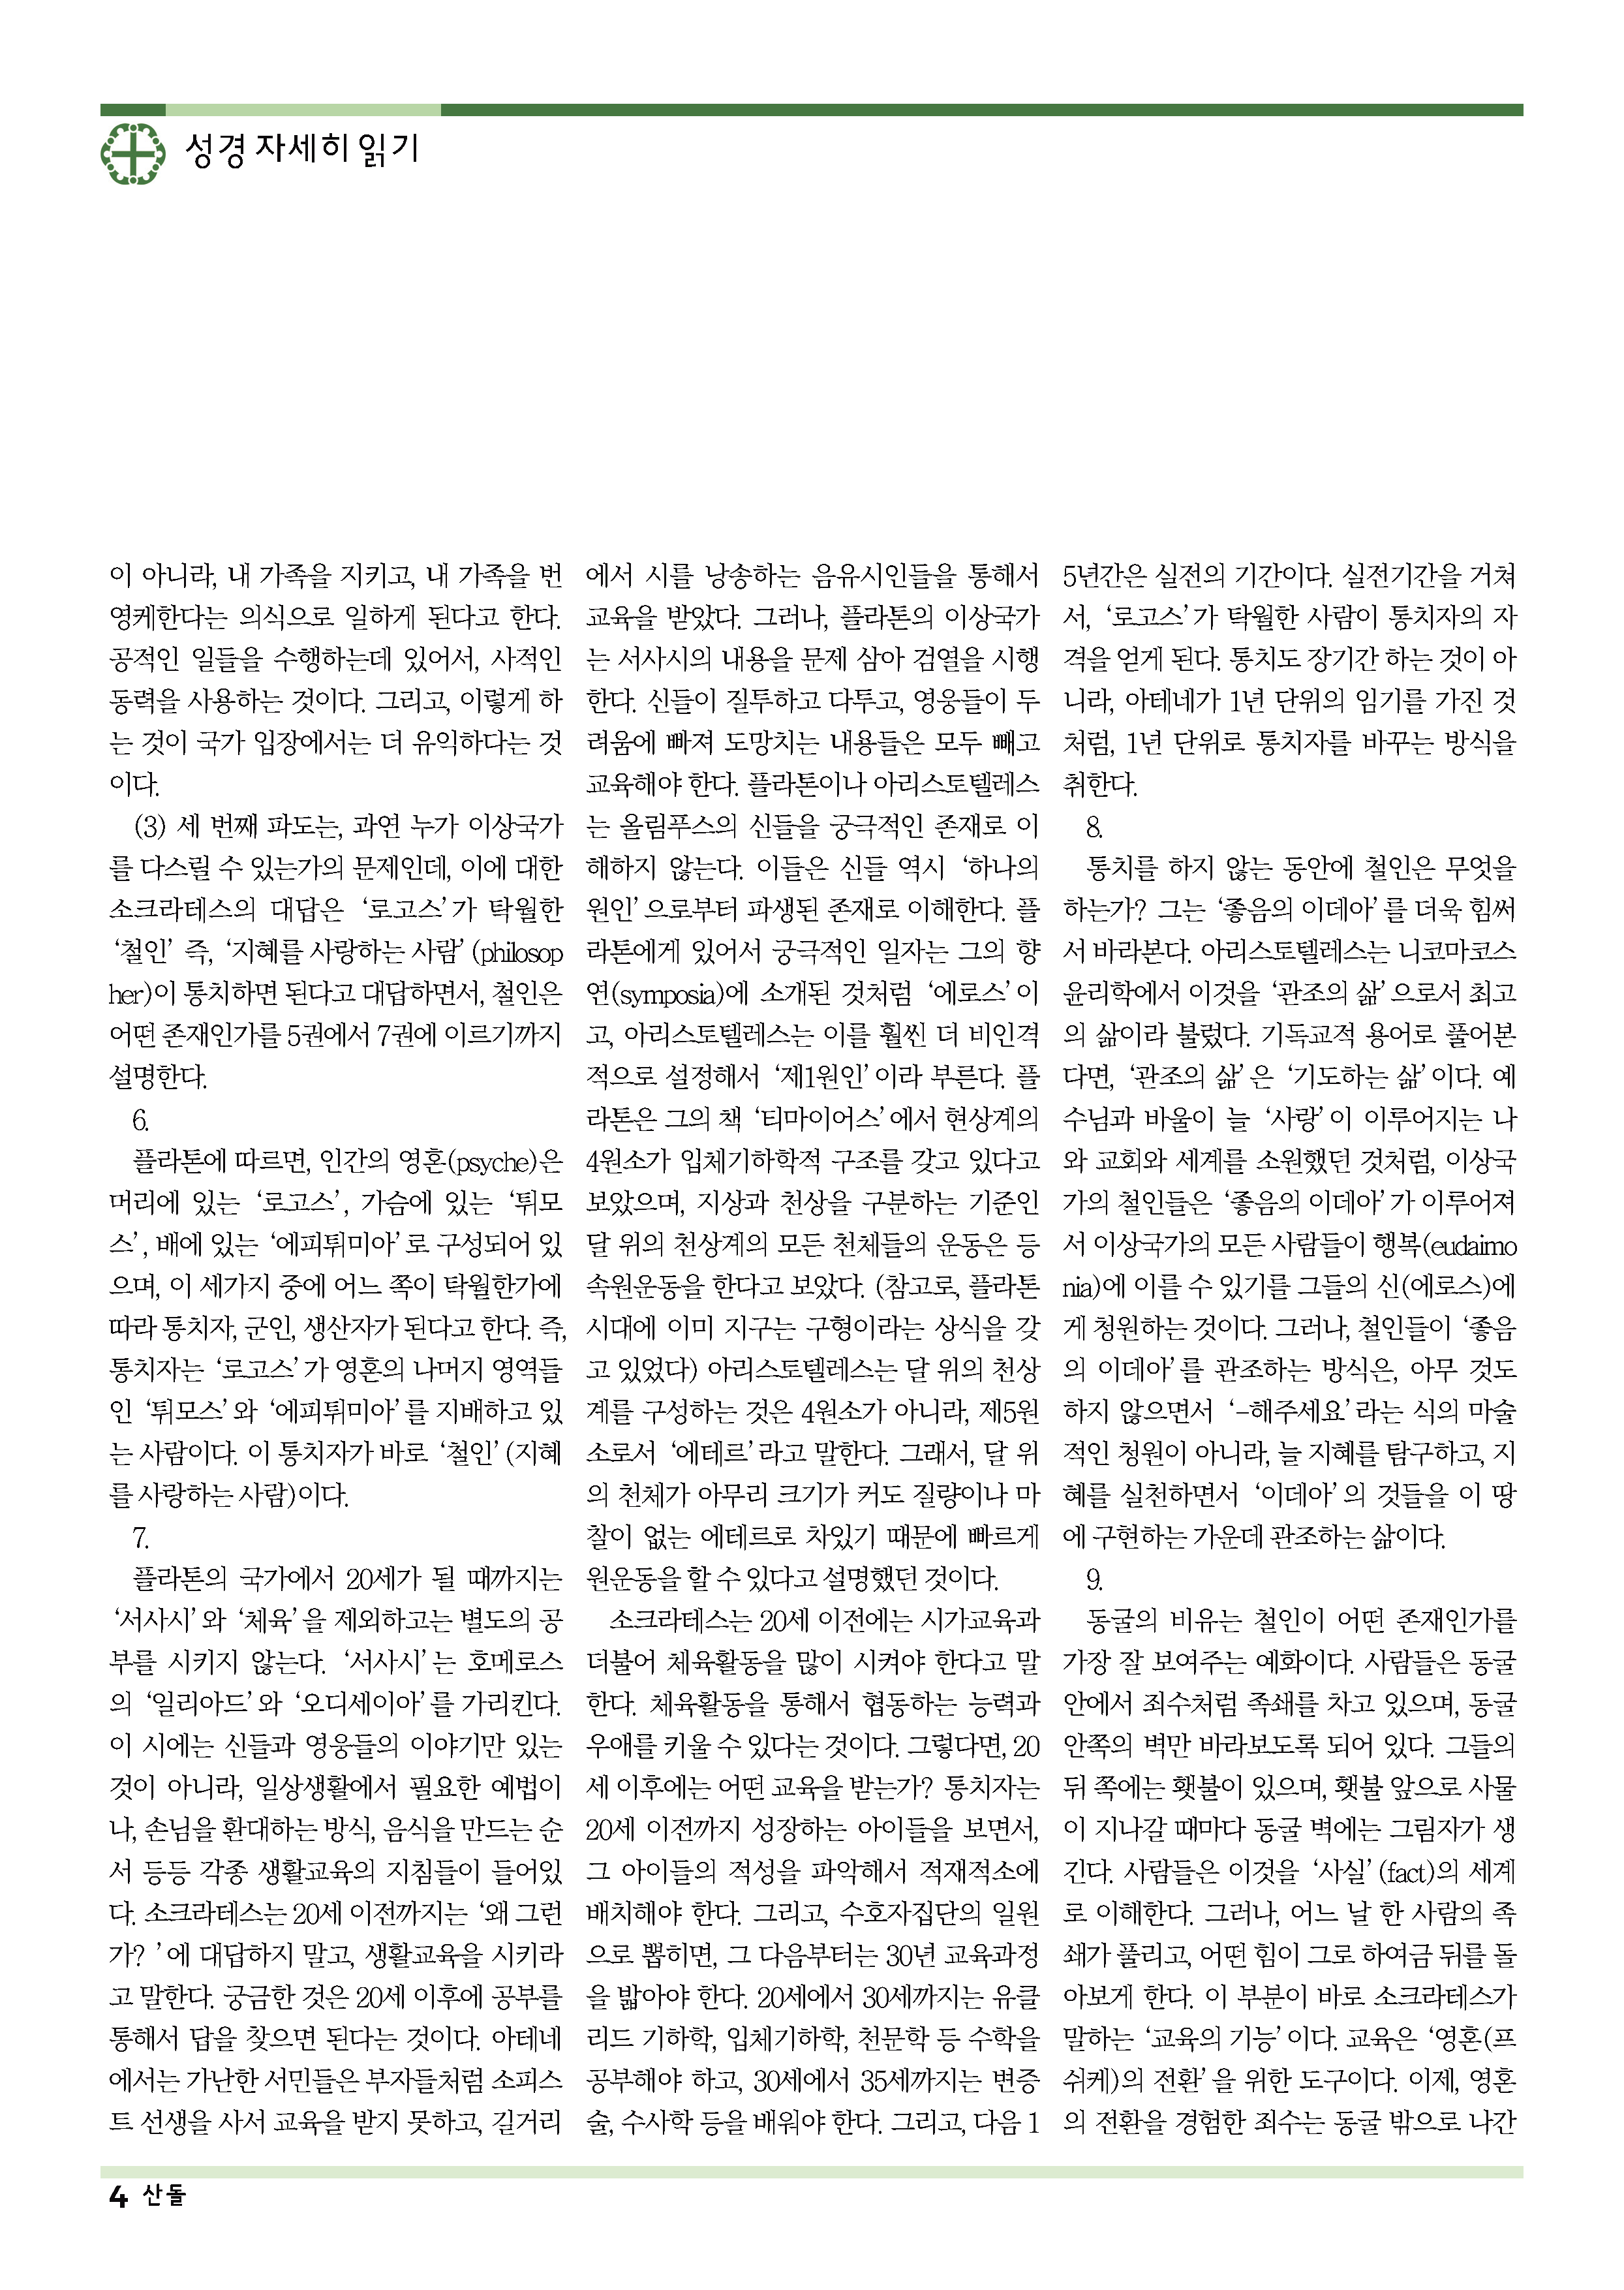 18sdjb0114_페이지_04.png